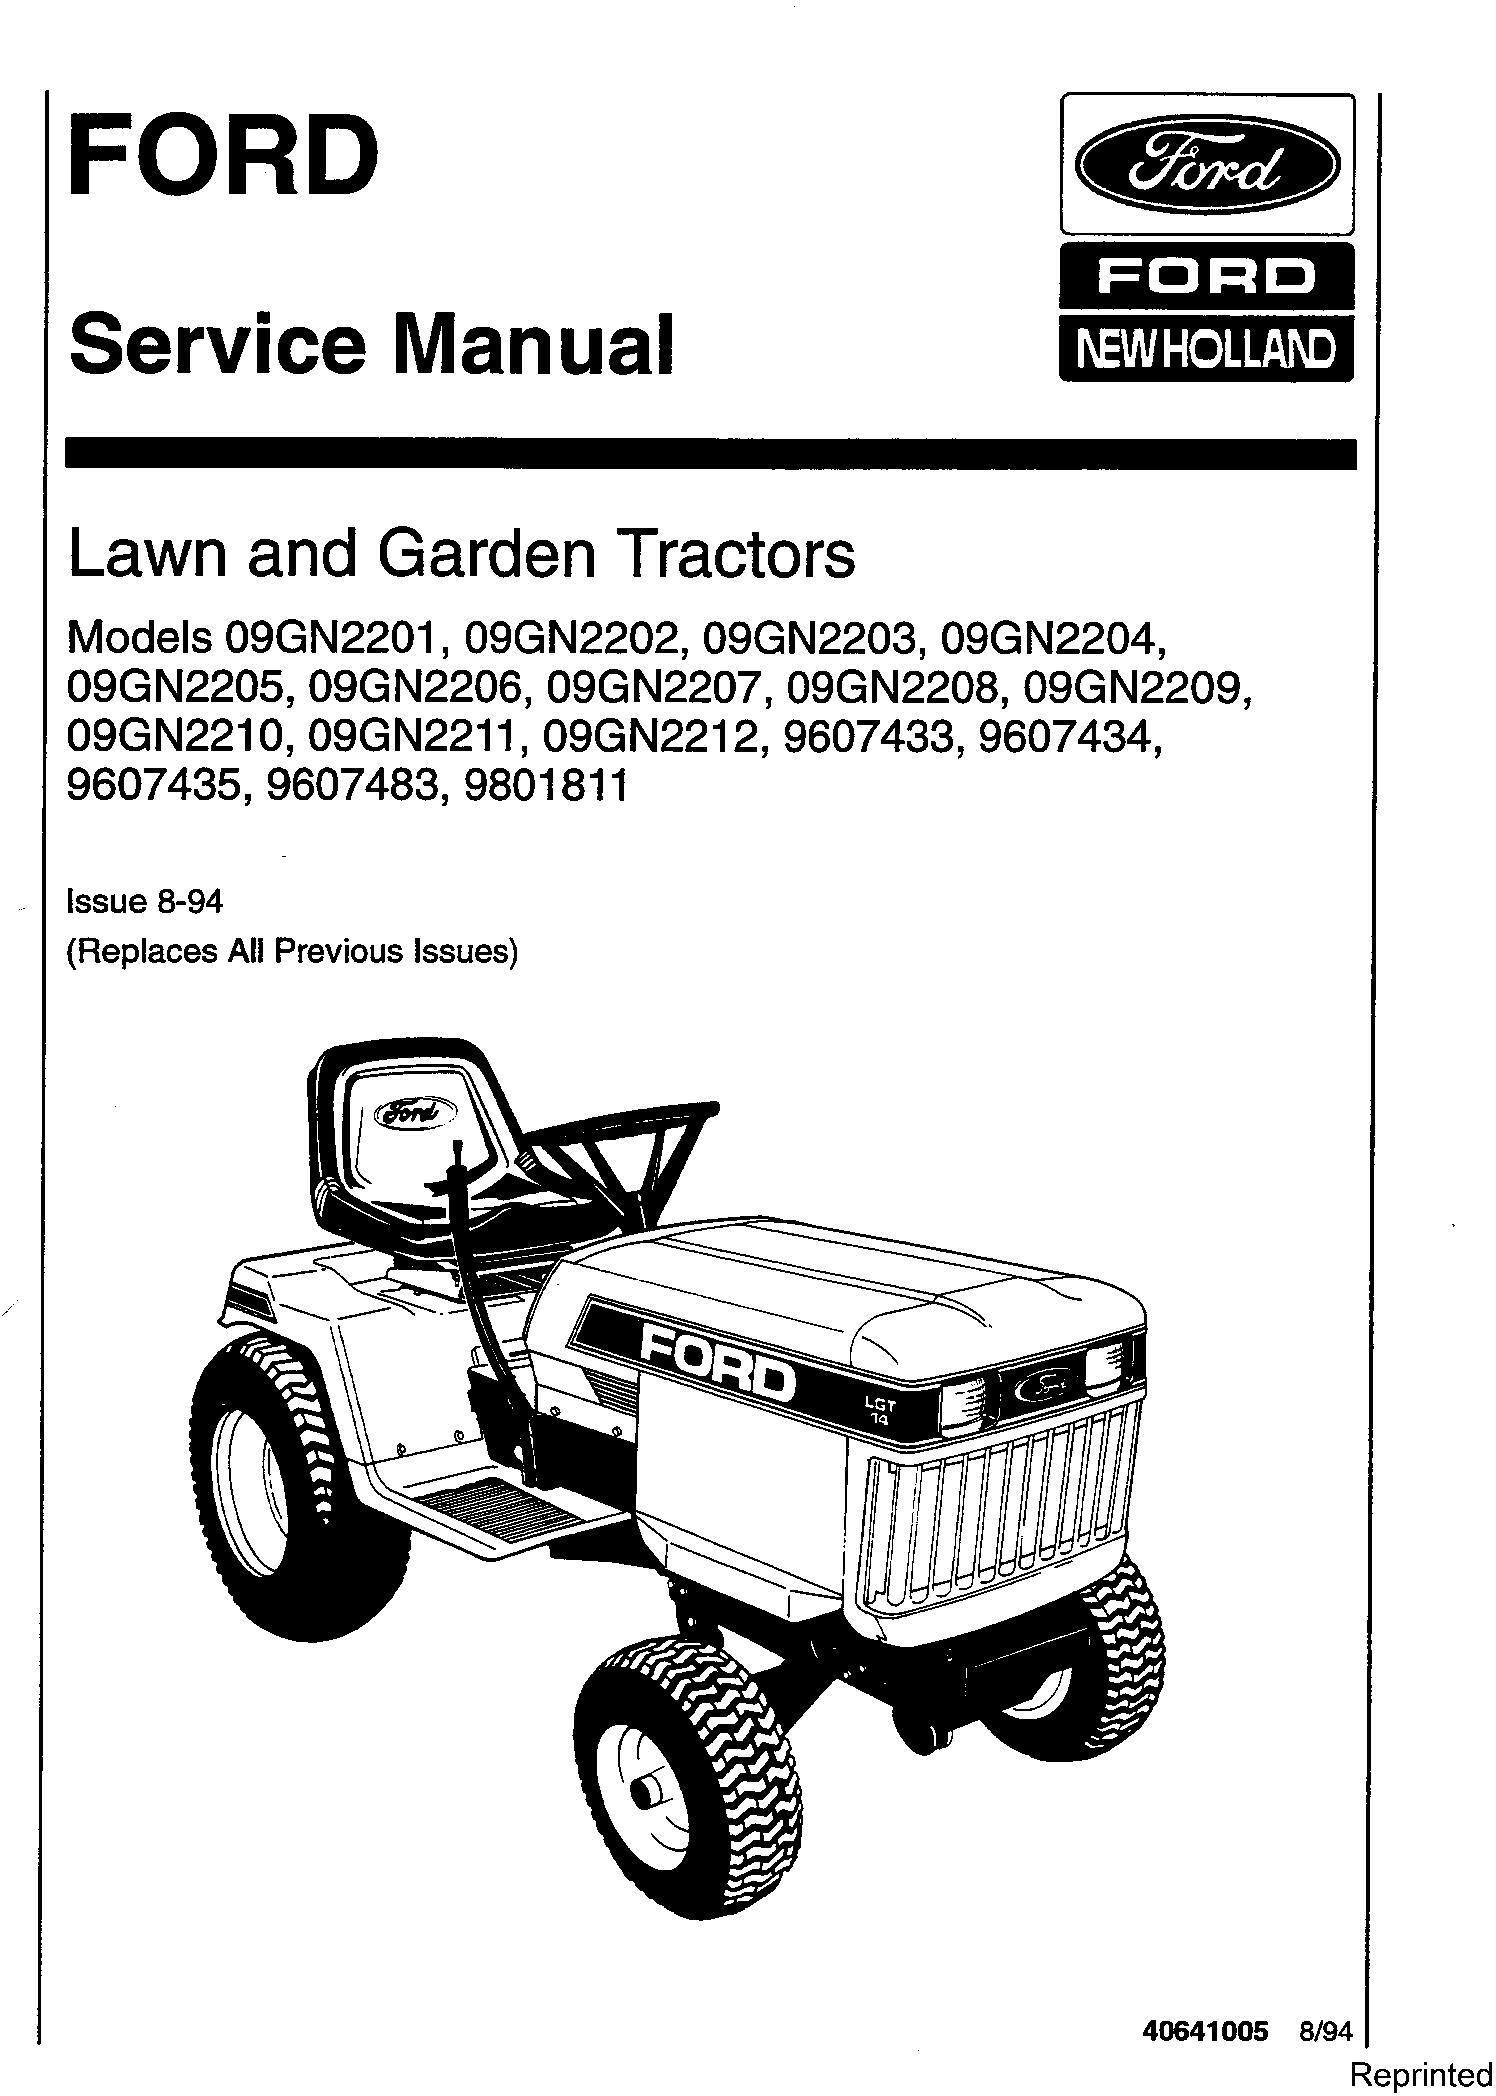 Ford Lgt12 H Lgt14 H Lgt17 H Lgt18h Lawn Amp Garden